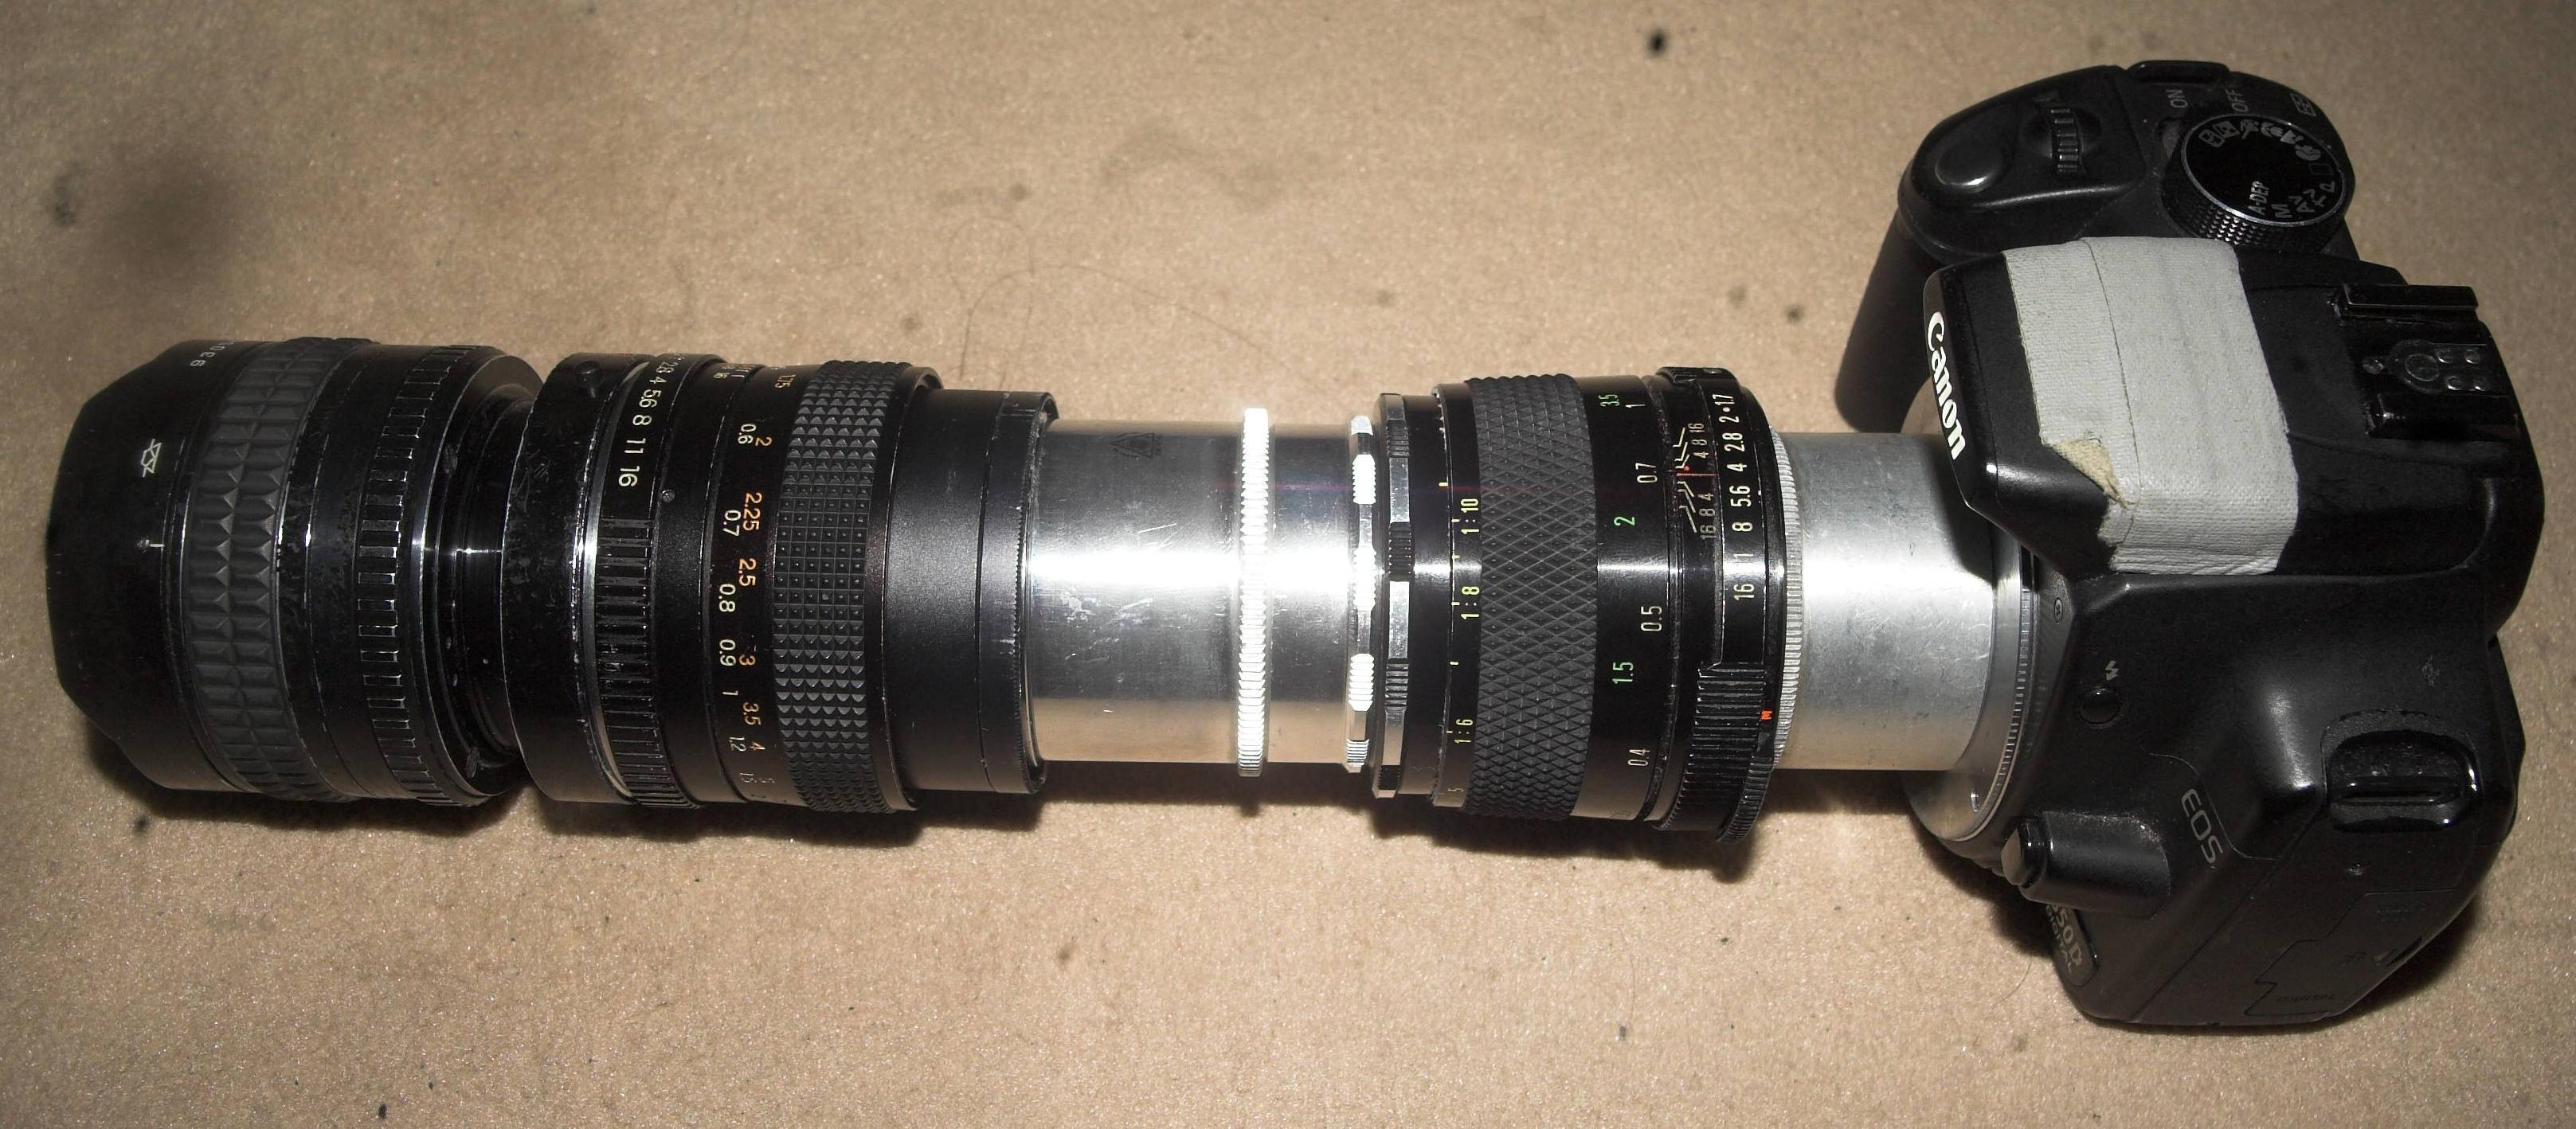 Nikon Objektive Für Vollformat Kameras: Nikon fx vollformat ...